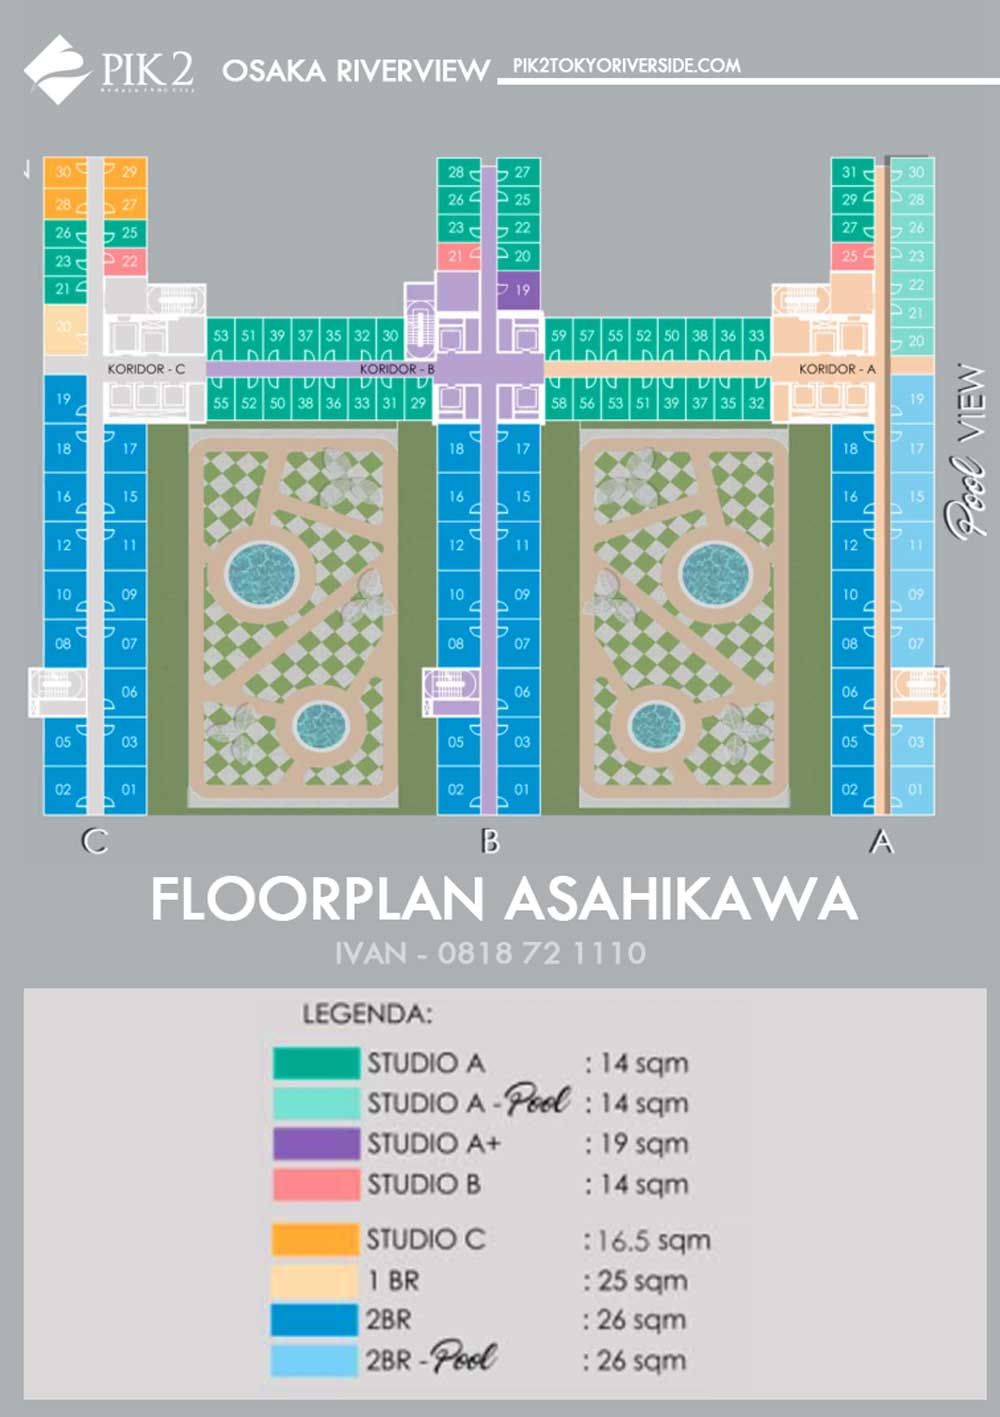 floor plan apartemen pik 2 osaka riverview